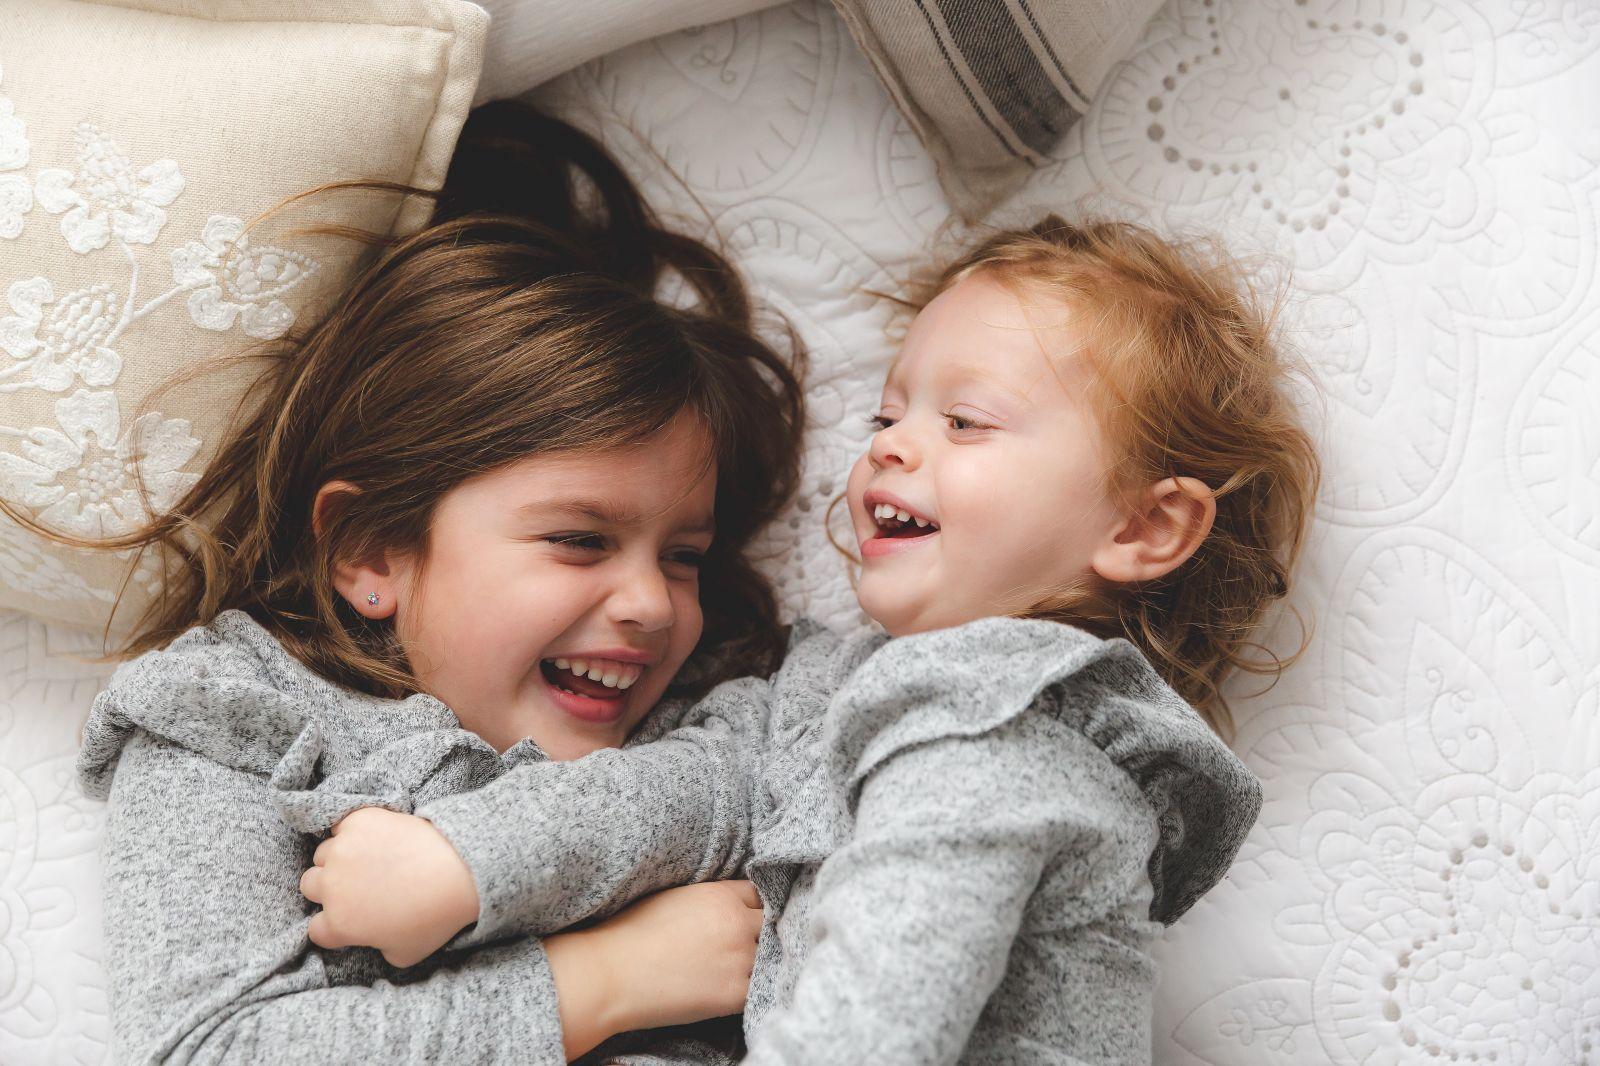 sisters tickling